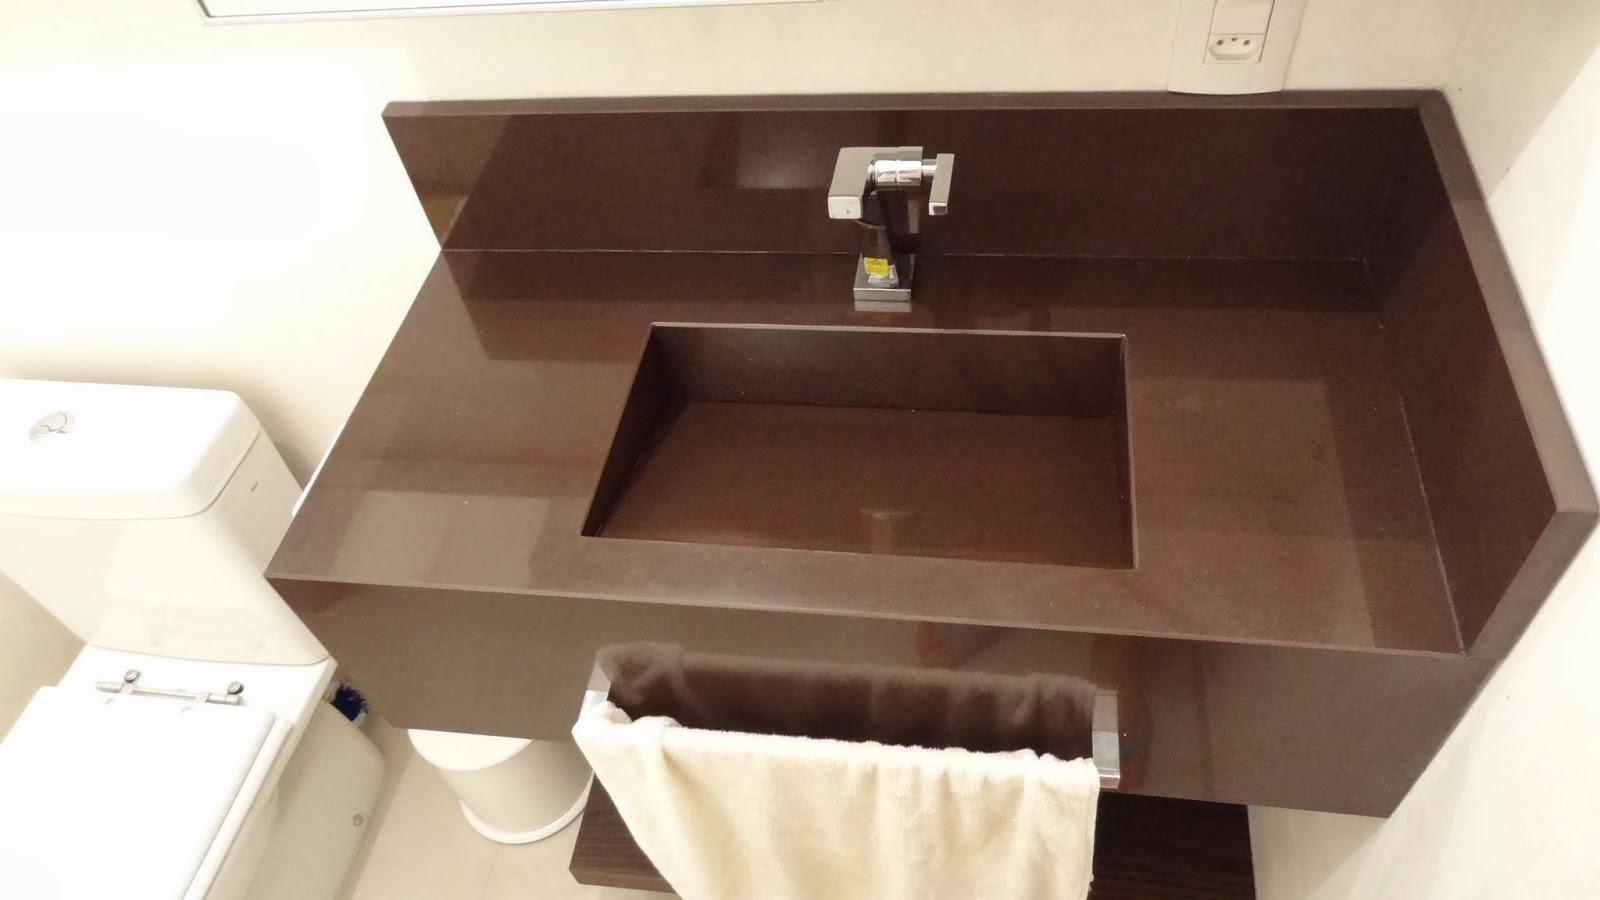 ao acabamento: Lavabo Social e Banheiro da Suíte Casal Reta final #A18E2A 1600x900 Acessorios Banheiro Perflex